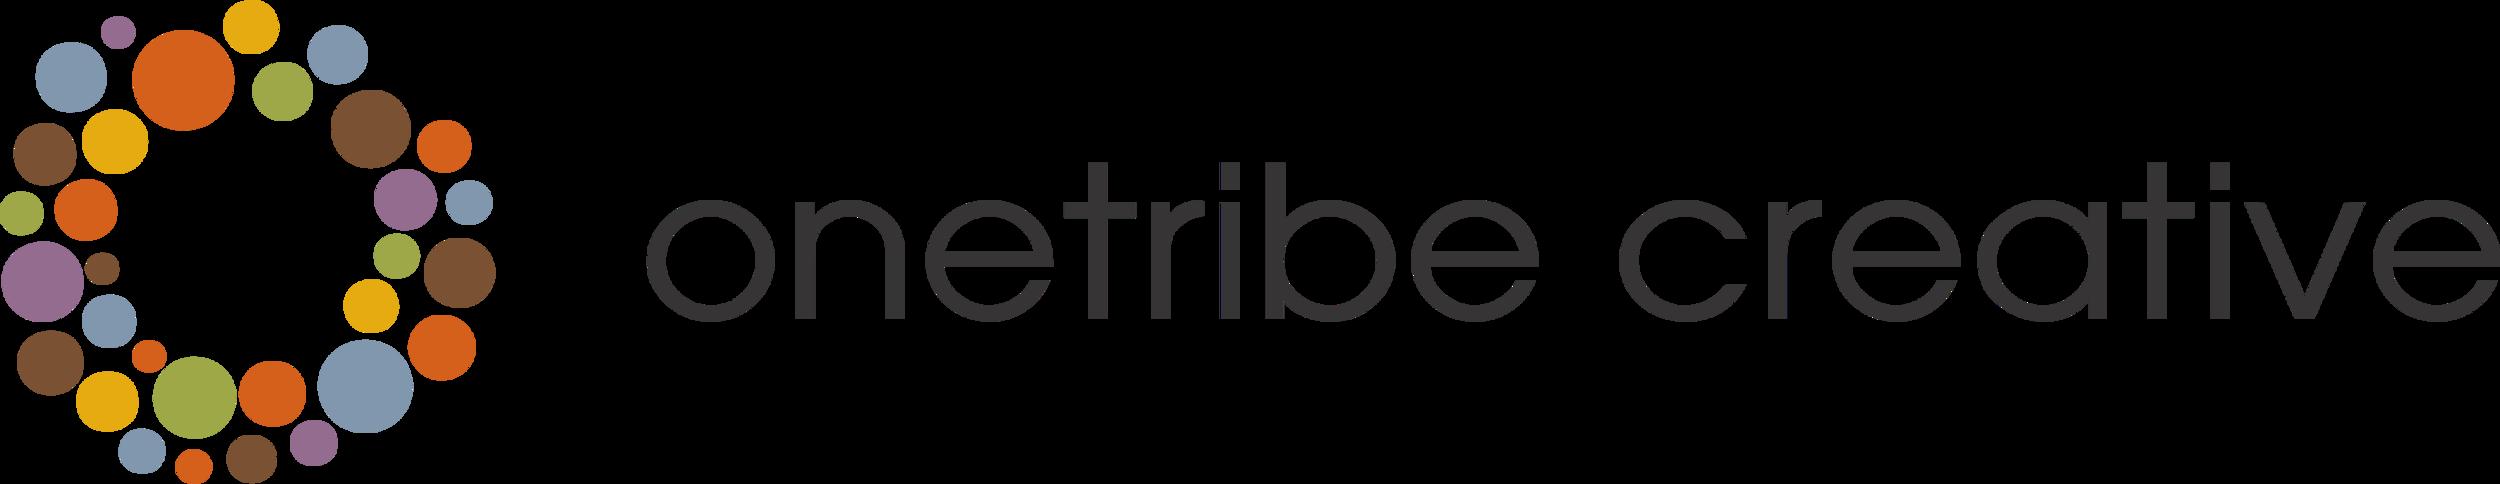 Onetribe logo.png